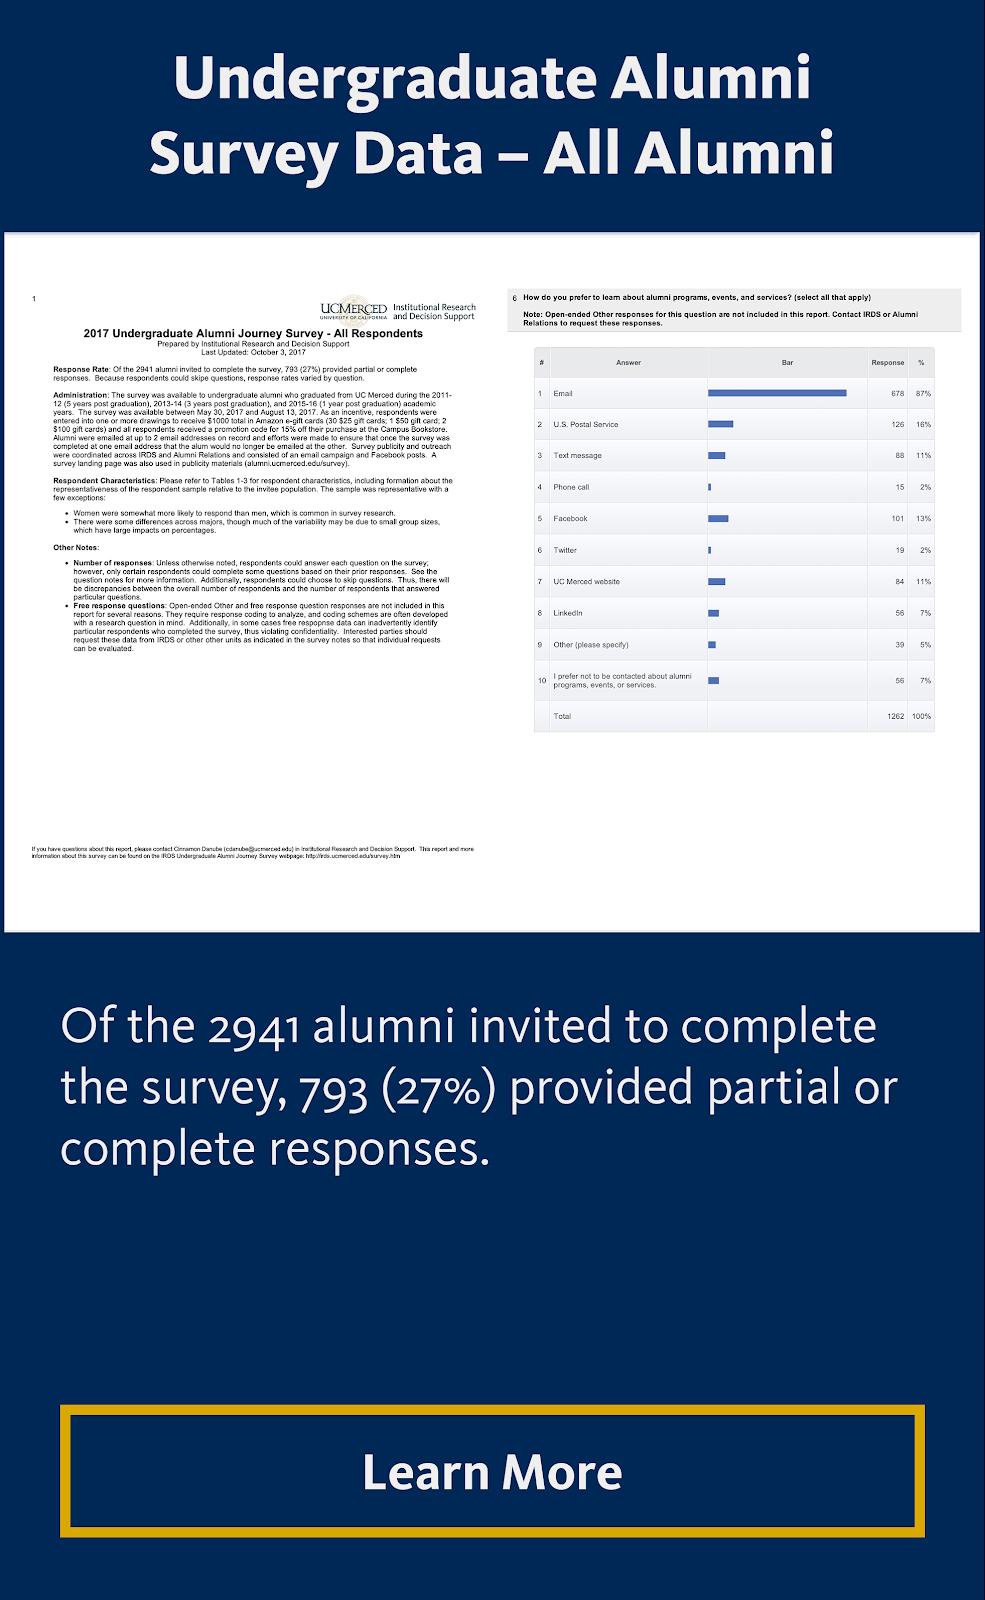 2017 Undergraduate Alumni Survey Data